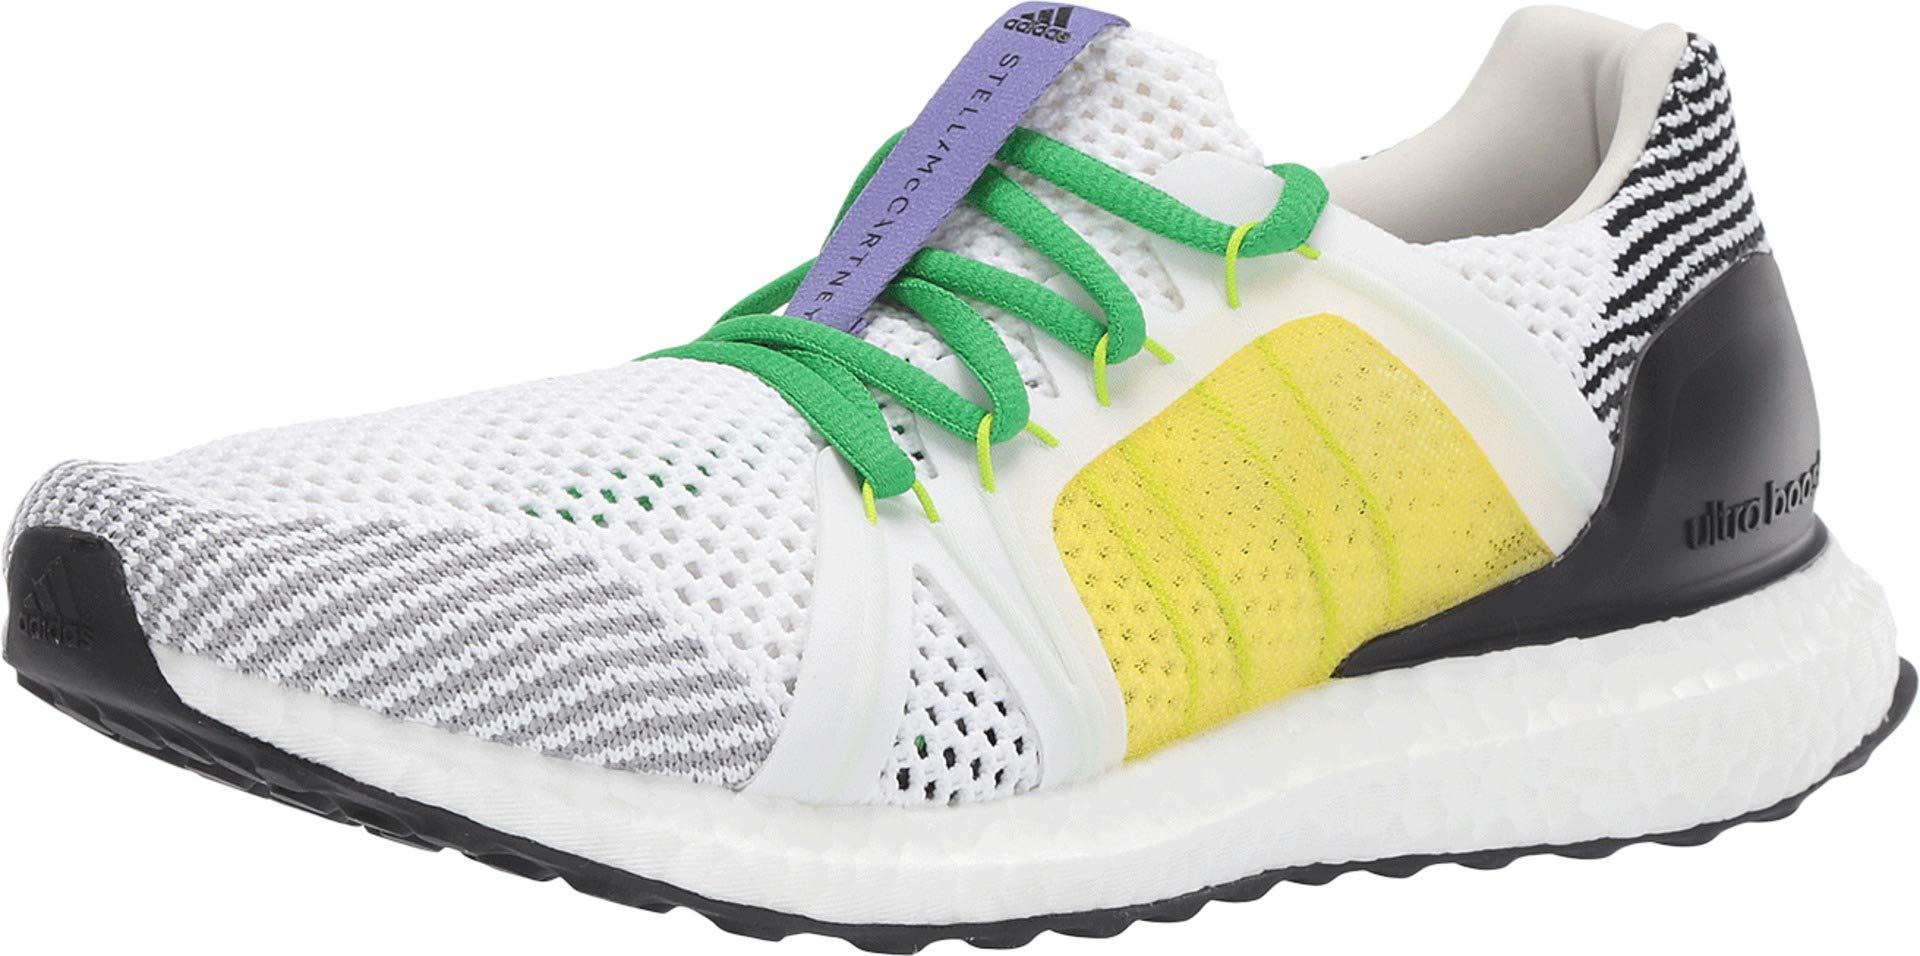 adidas by Stella McCartney Women's Ultraboost Footwear White/Black/White/Fresh Lemon 5 M US